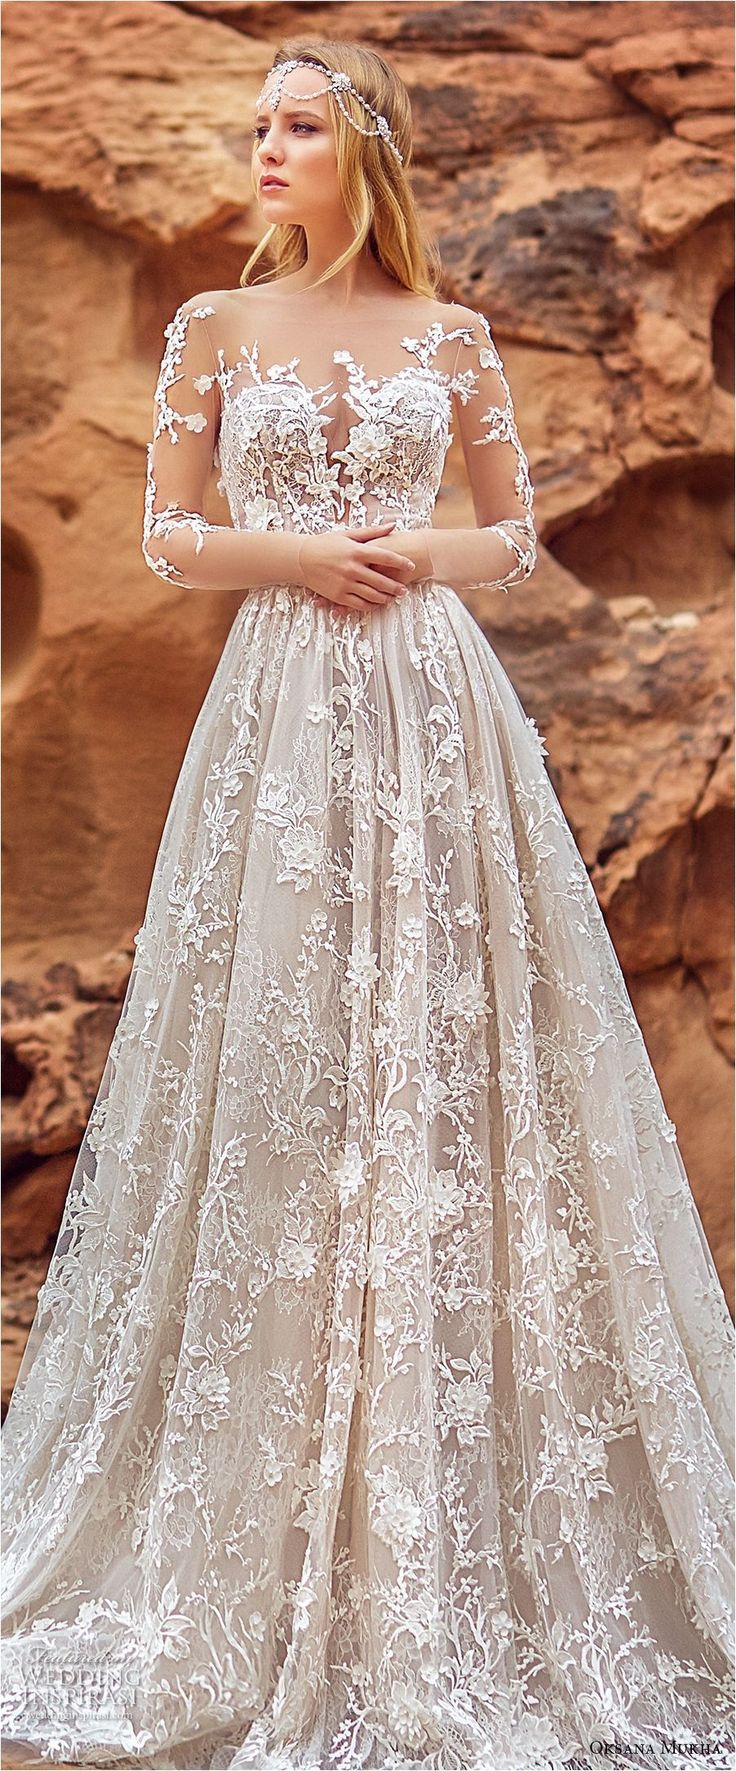 Best 25+ Cute wedding dress ideas on Pinterest | Vintage wedding ...